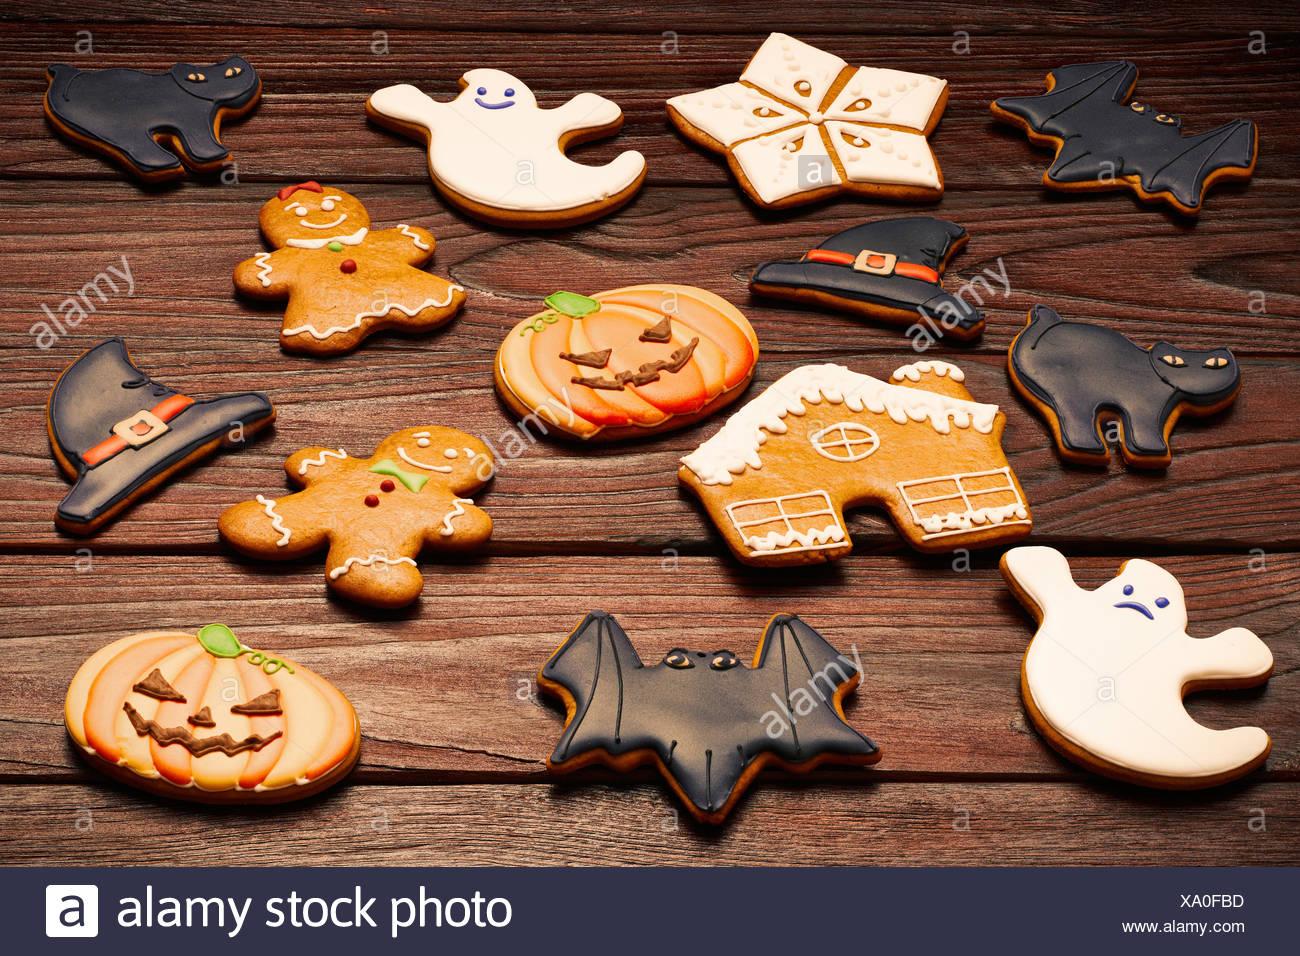 Halloween And Christmas.Halloween And Christmas Homemade Gingerbread Cookies Stock